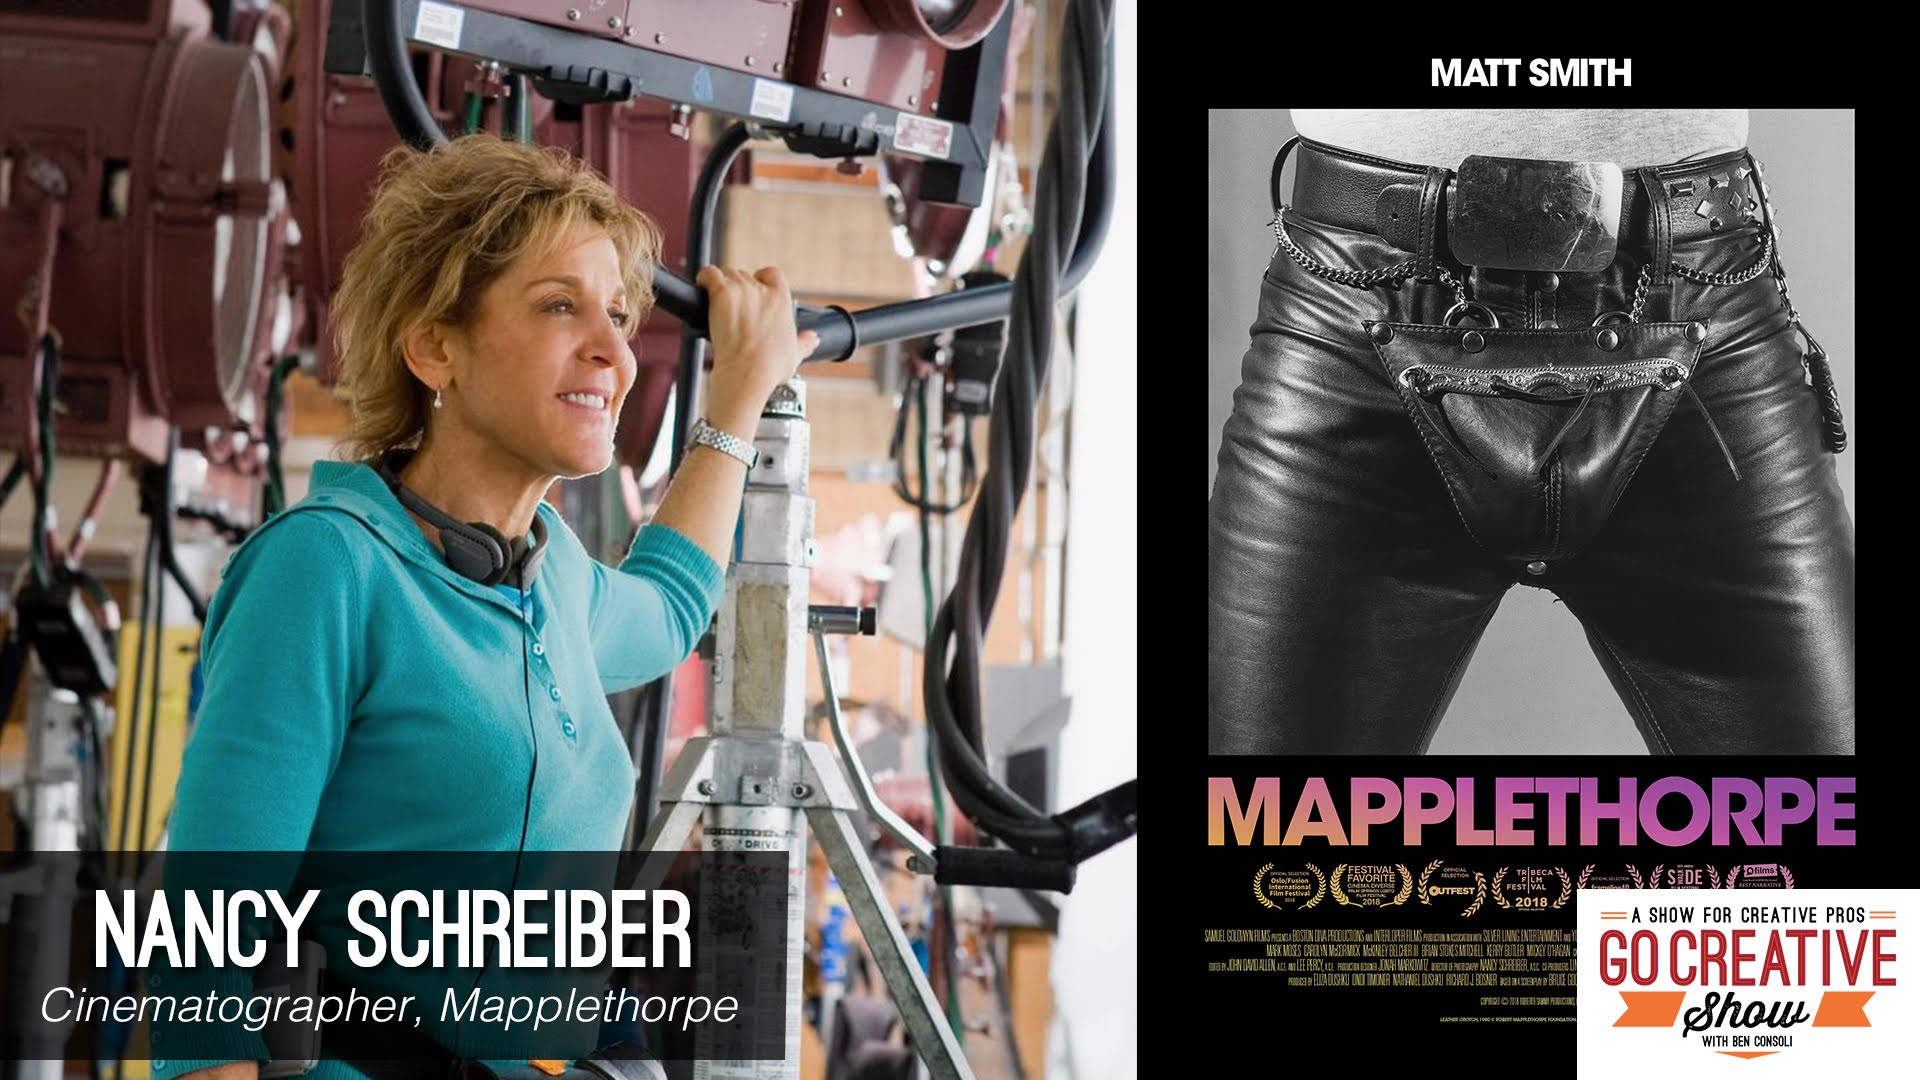 Mapplethorpe Cinematography with Nancy Schreiber - Newsshooter